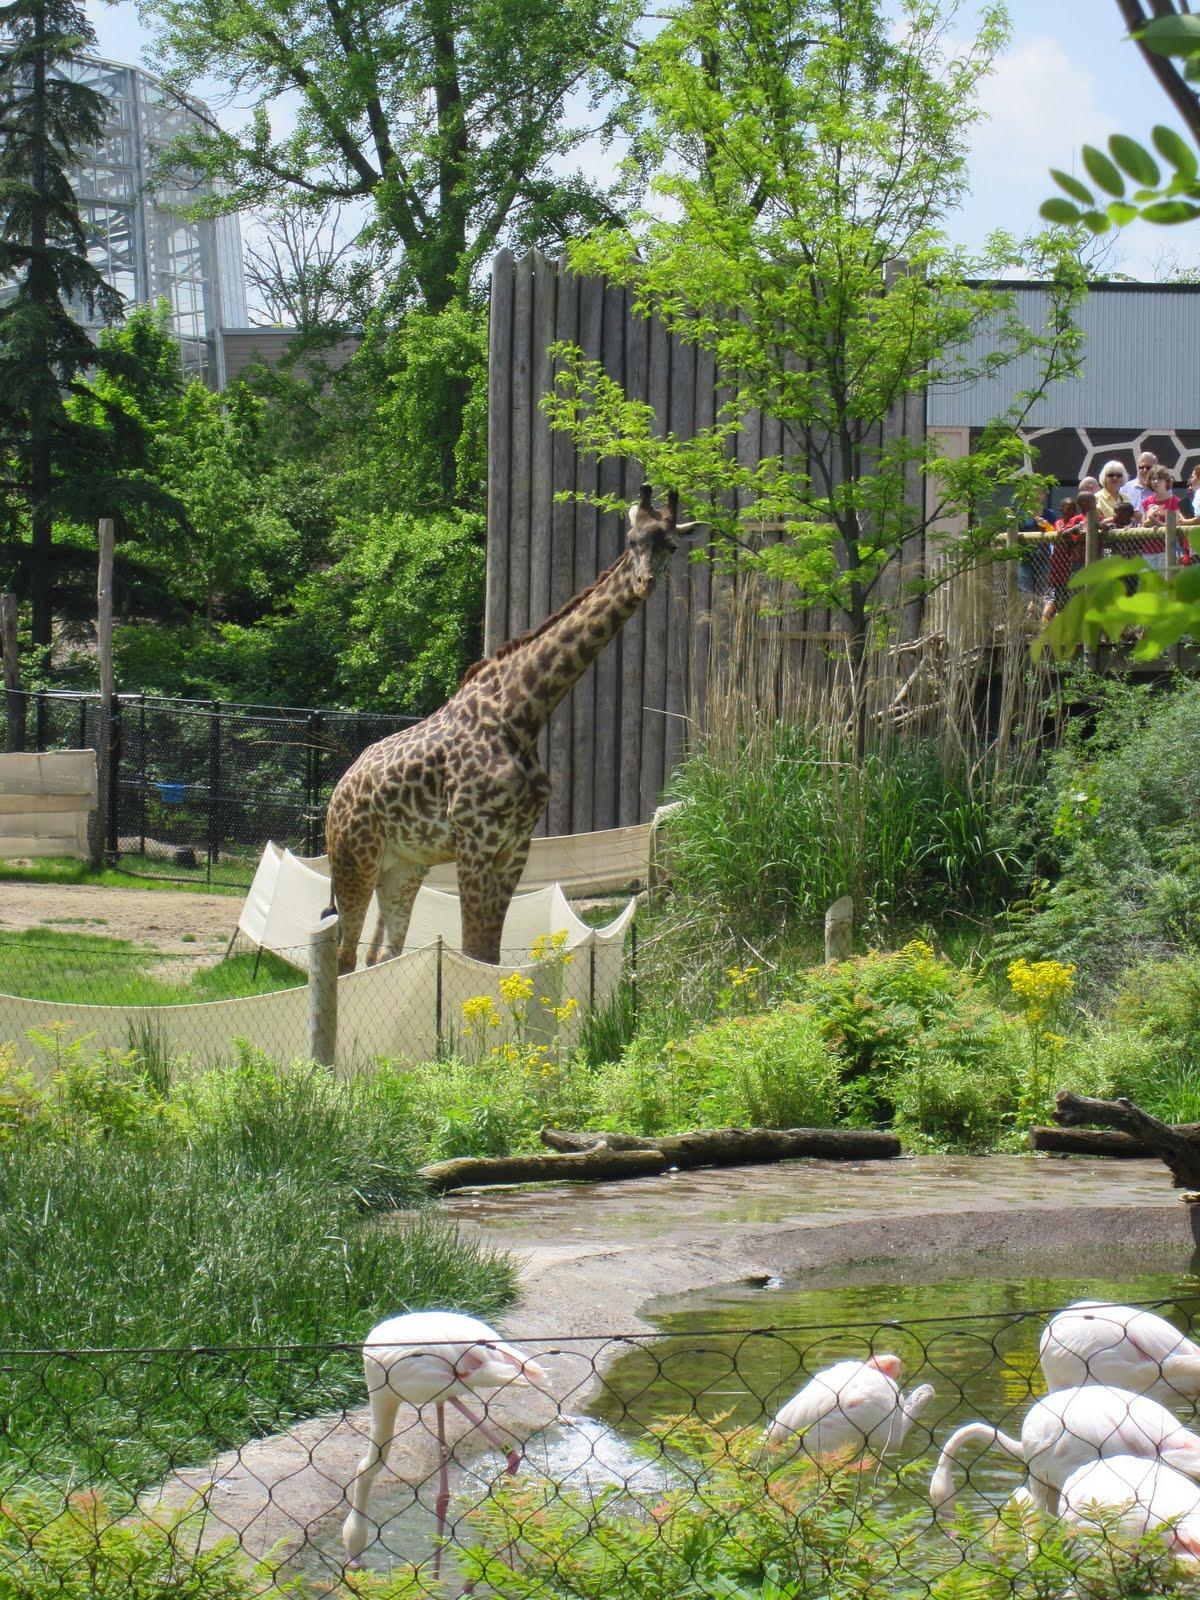 Queen City Yam Cincinnati Zoo And Botanical Gardens